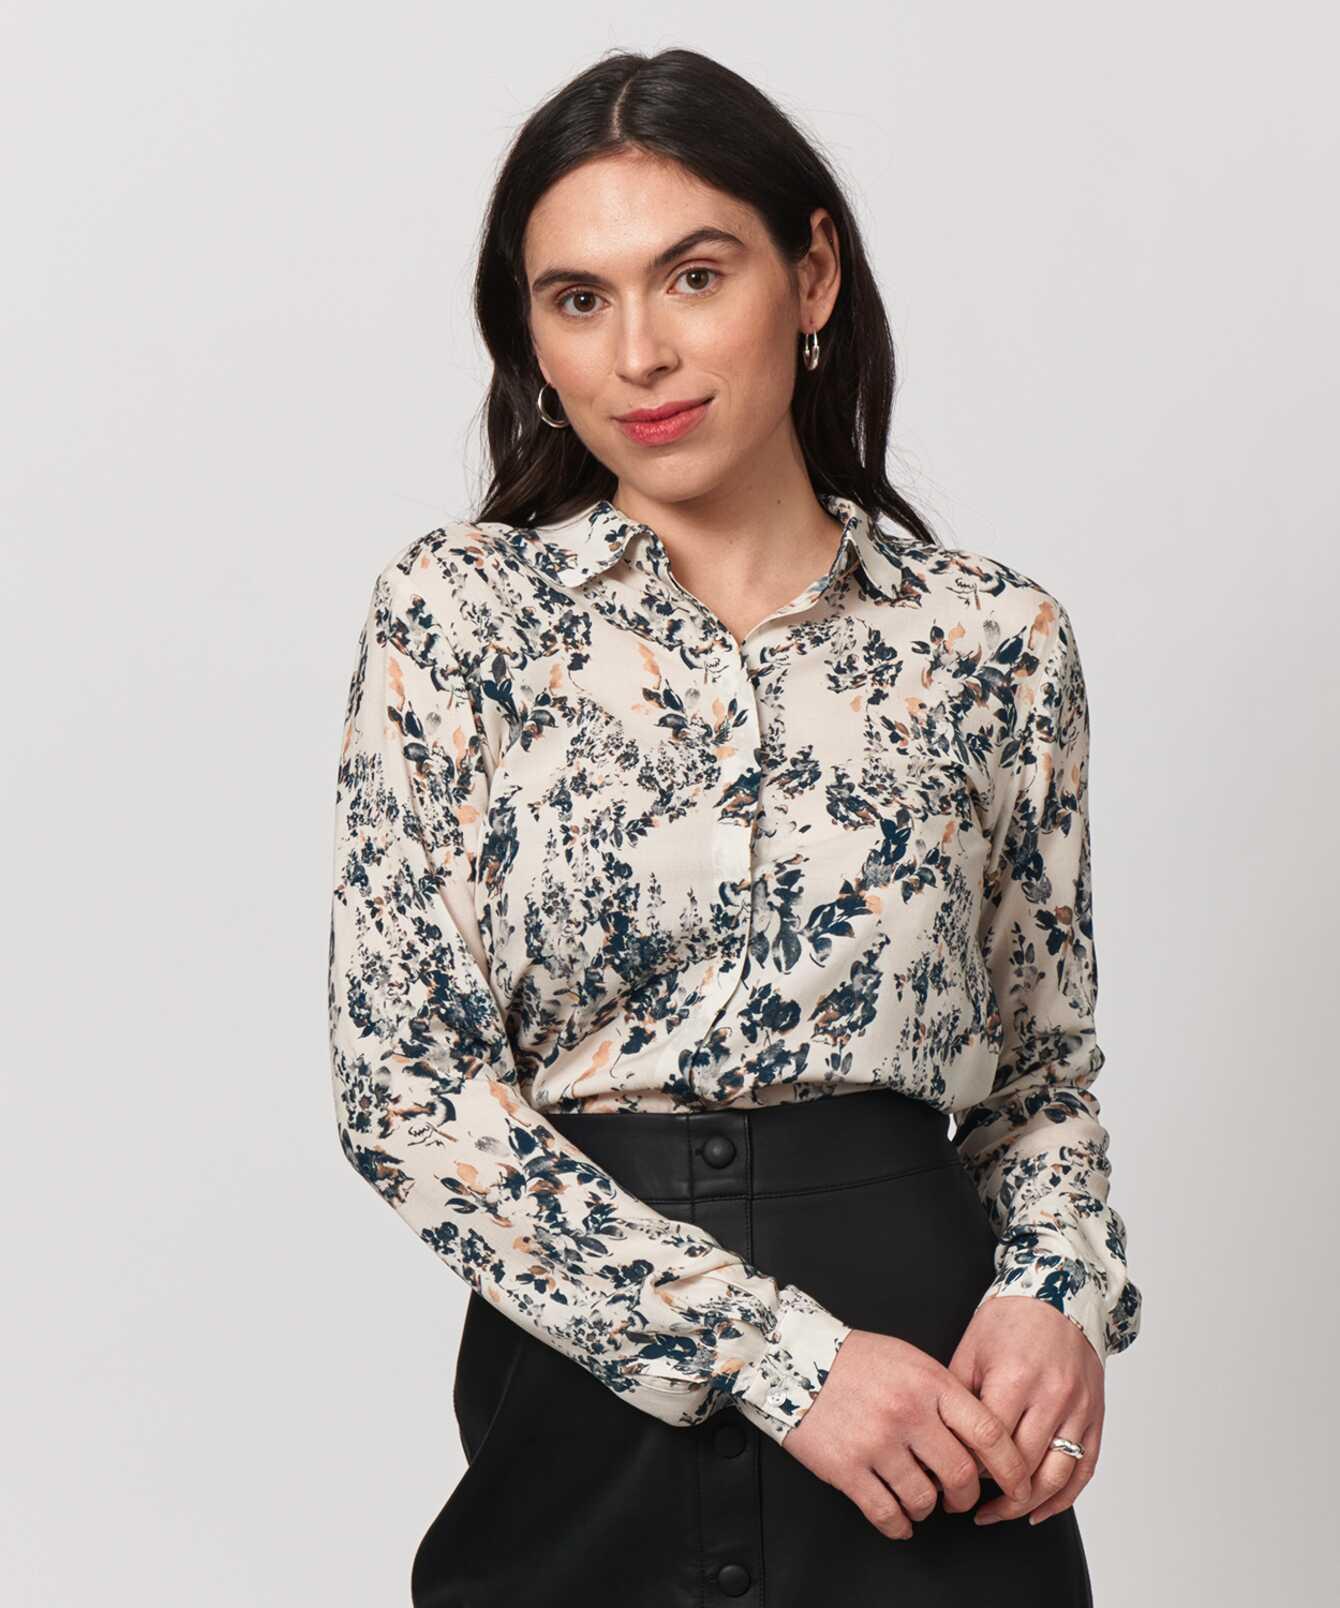 Skjorta Gina Mirage The Shirt Factory